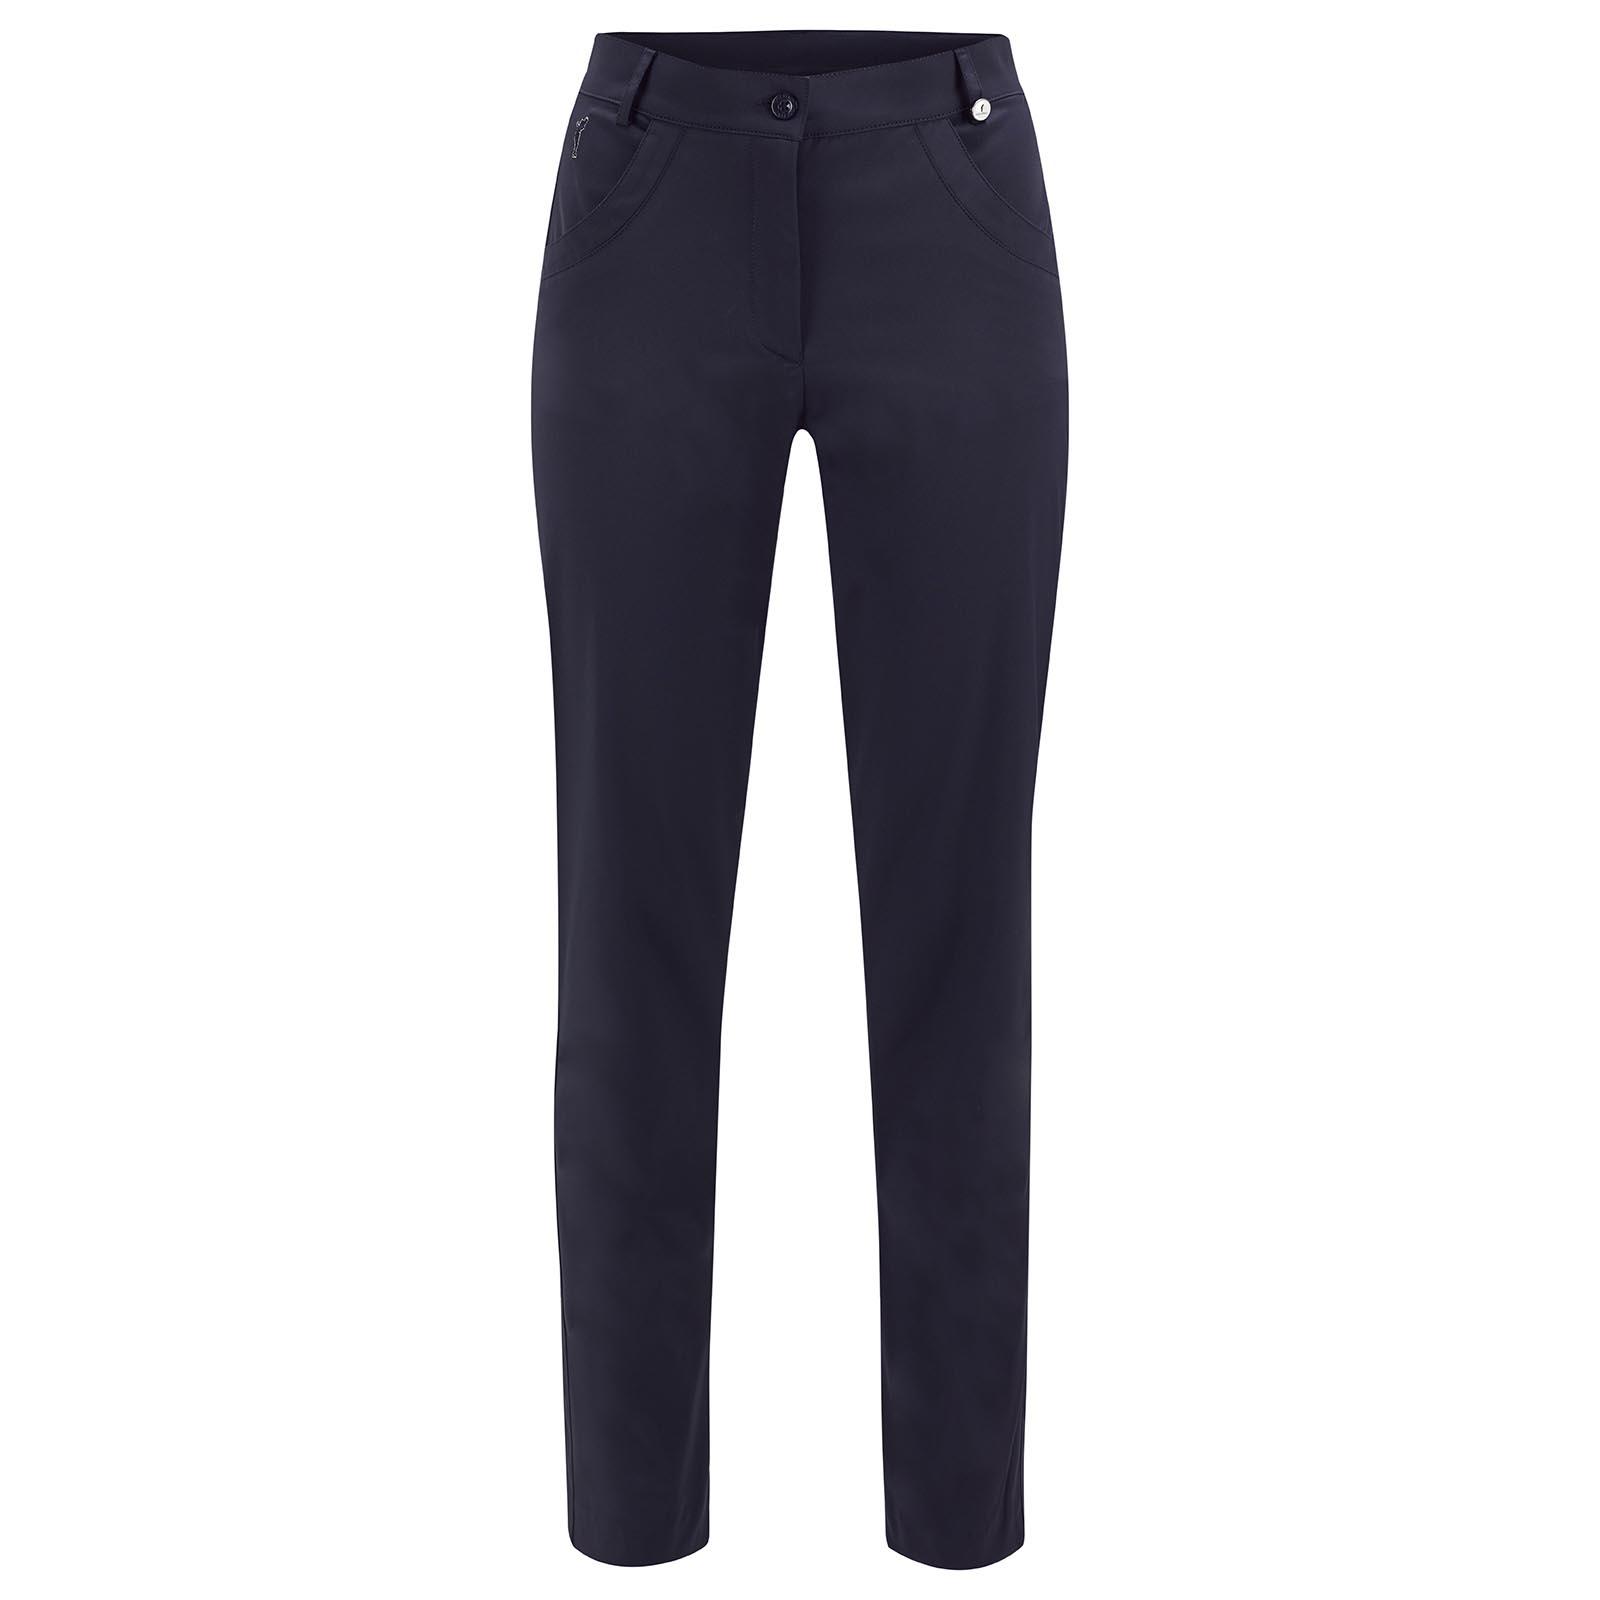 GOLFINO ladies' 7/8 functional stretch trousers